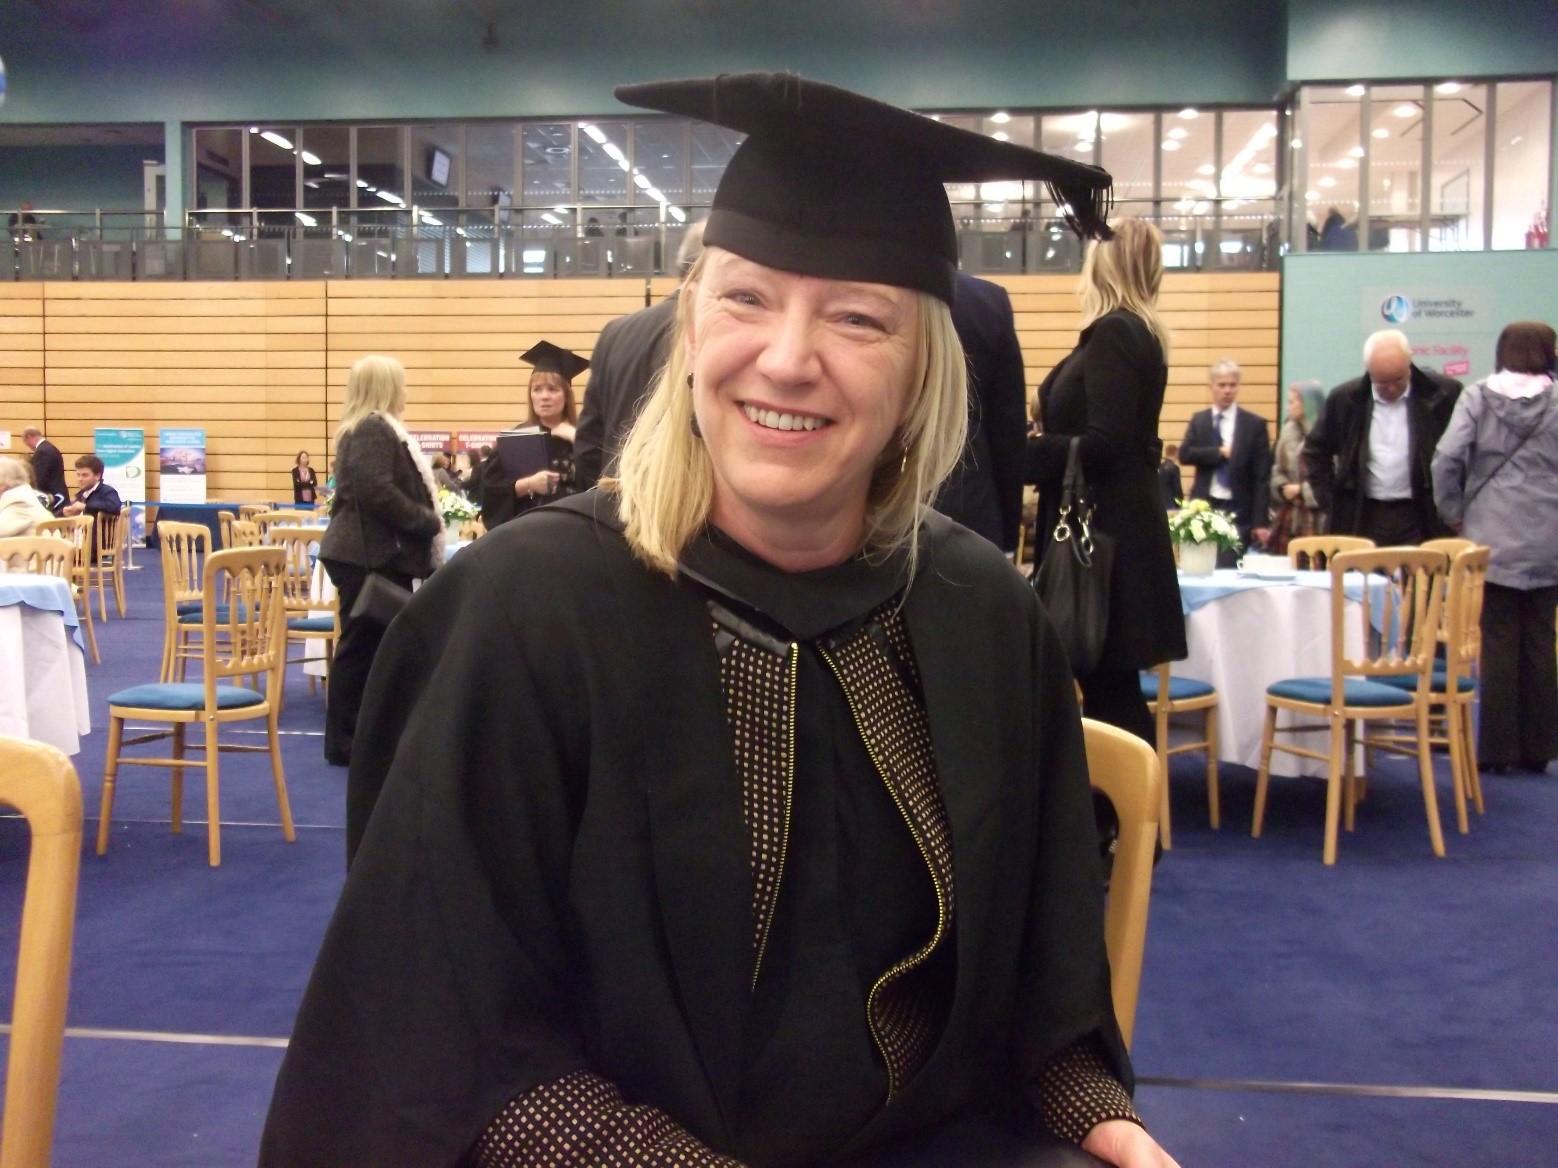 Newman graduate Yvonne at graduation ceremony